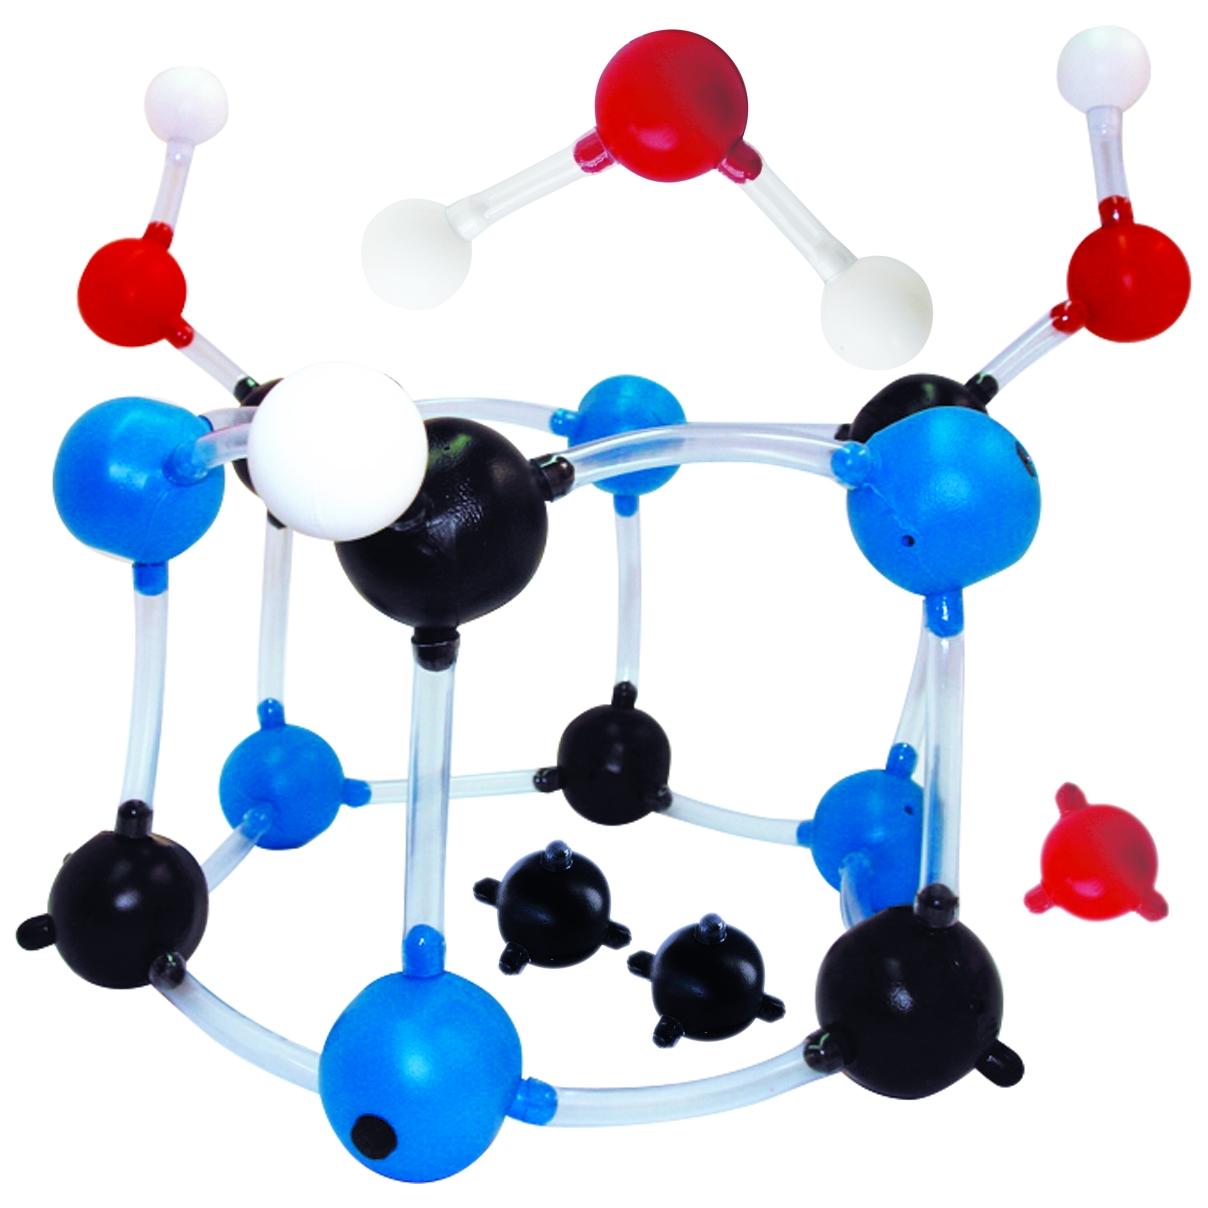 C Users ISRAEL Pictures IMAGENES PSD 1 - copia (5) 2057 Modelo Molecular